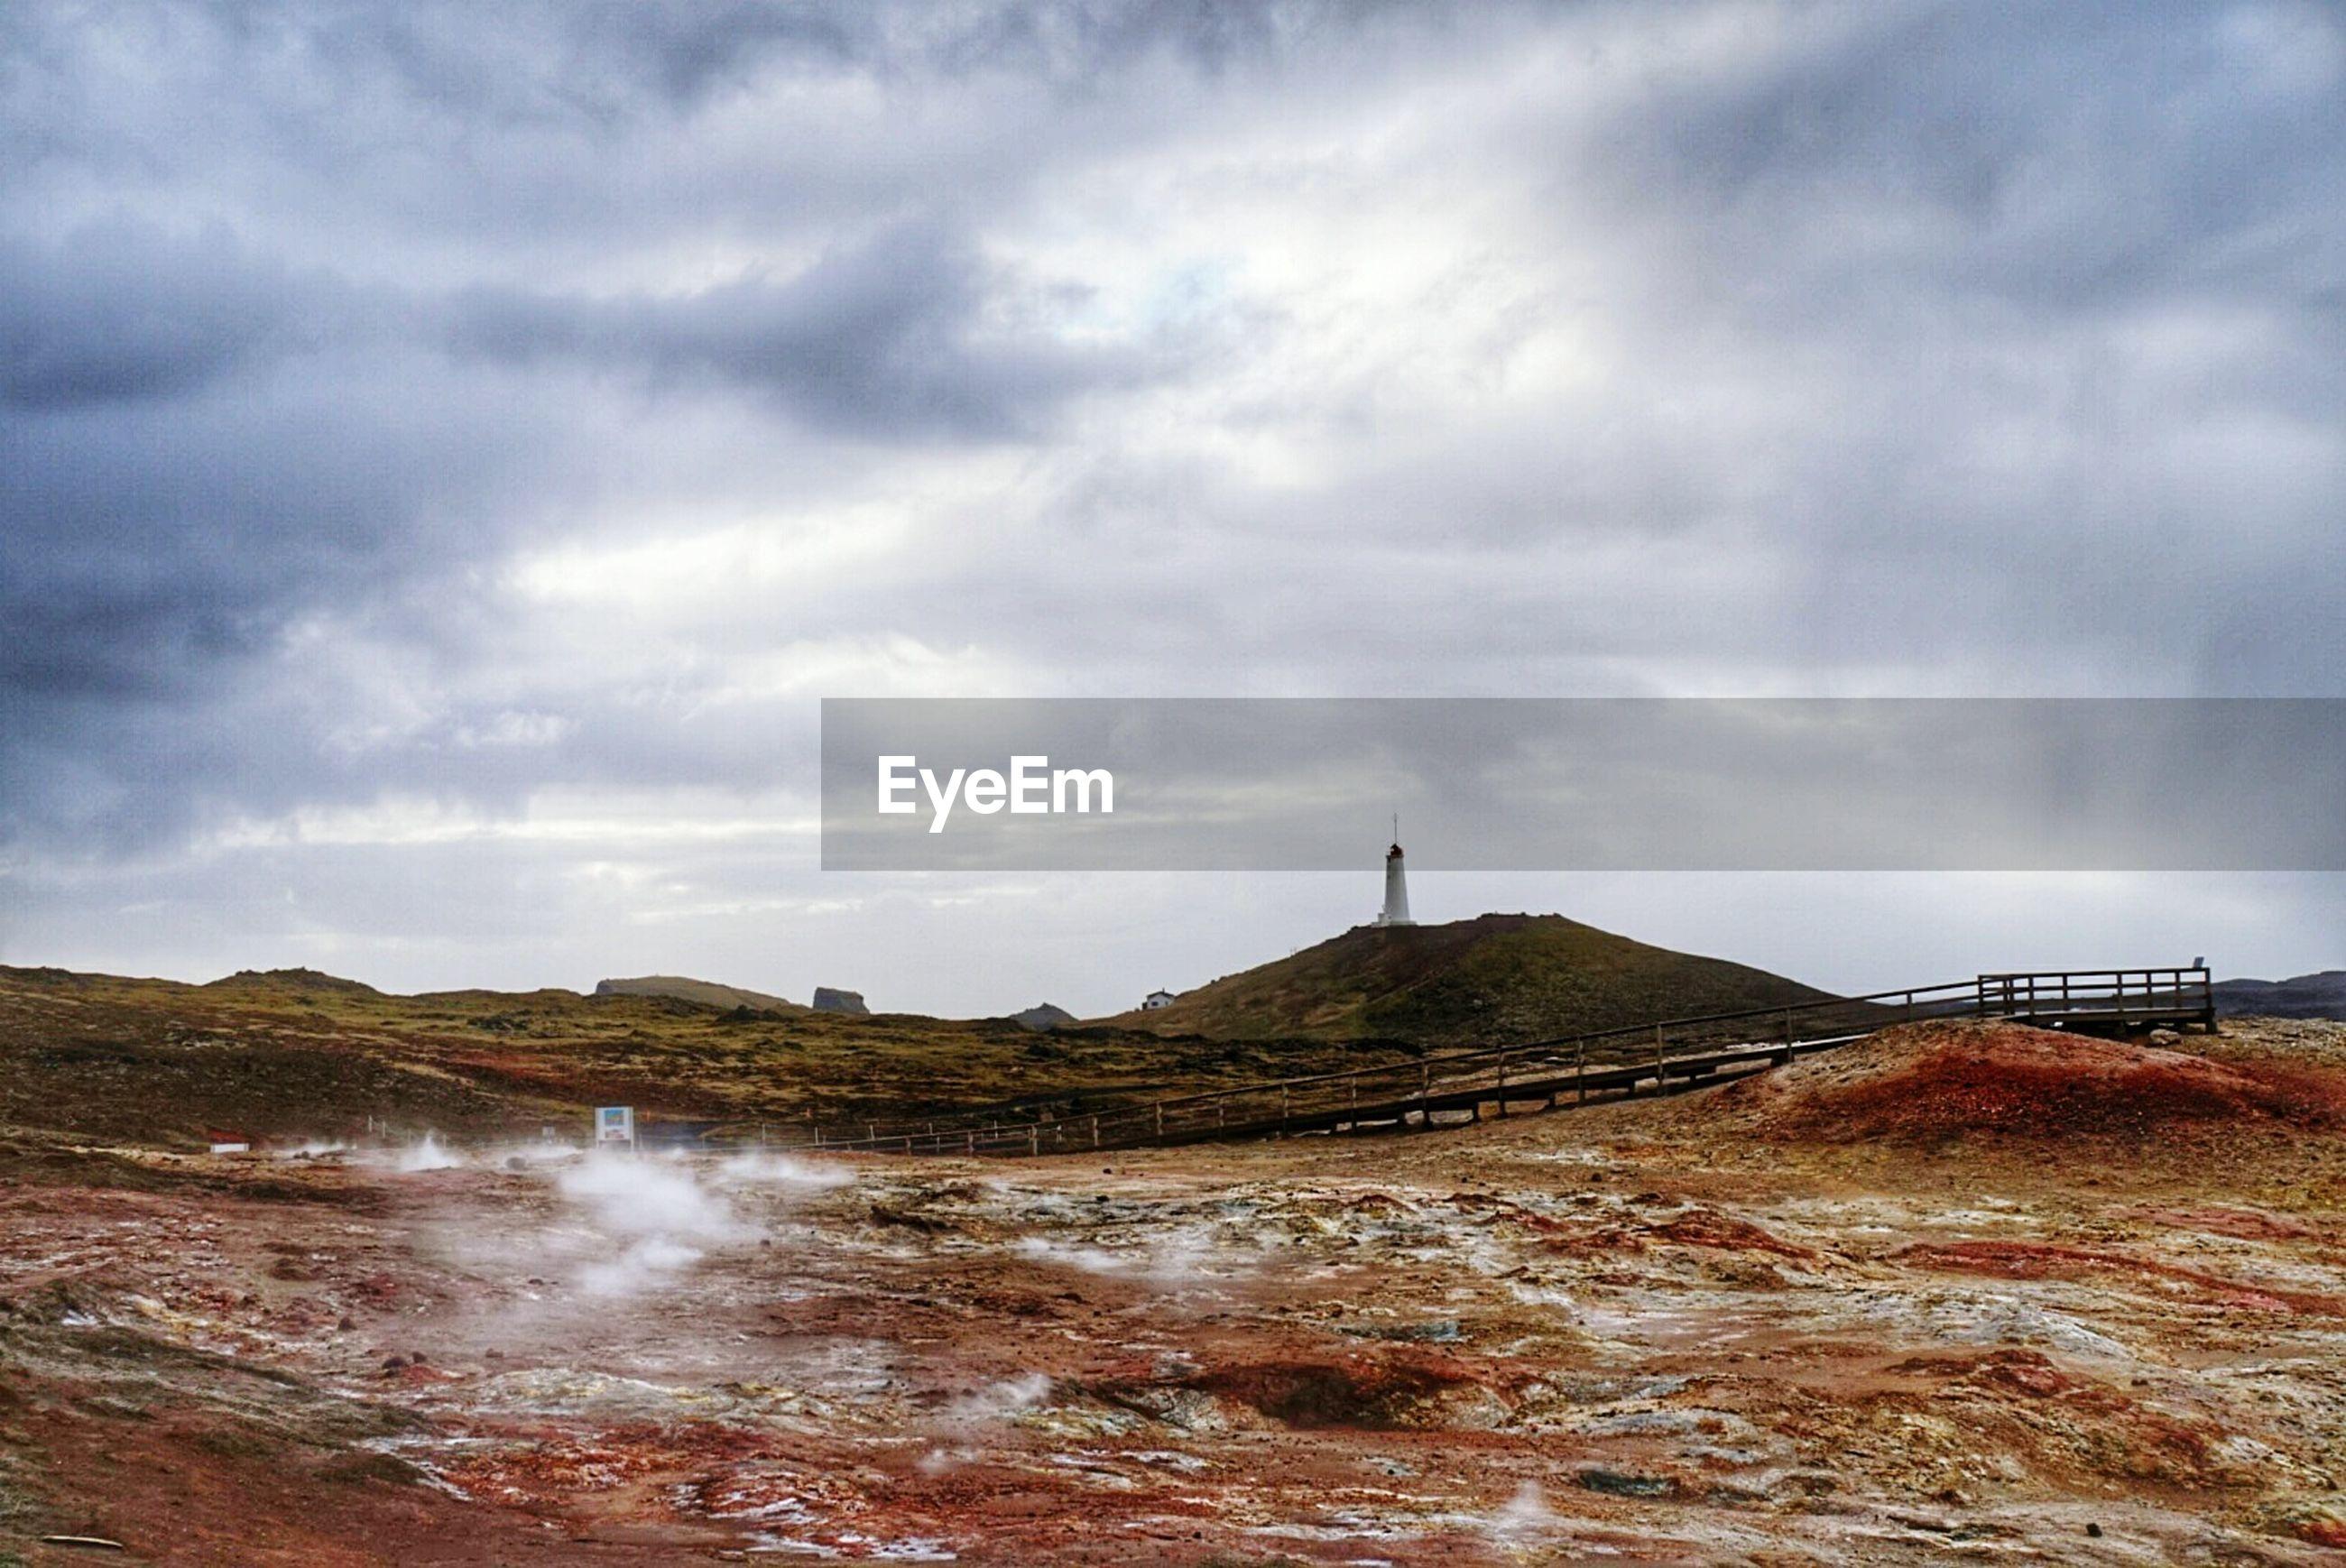 Hot springs at reykjanes peninsula against cloudy sky